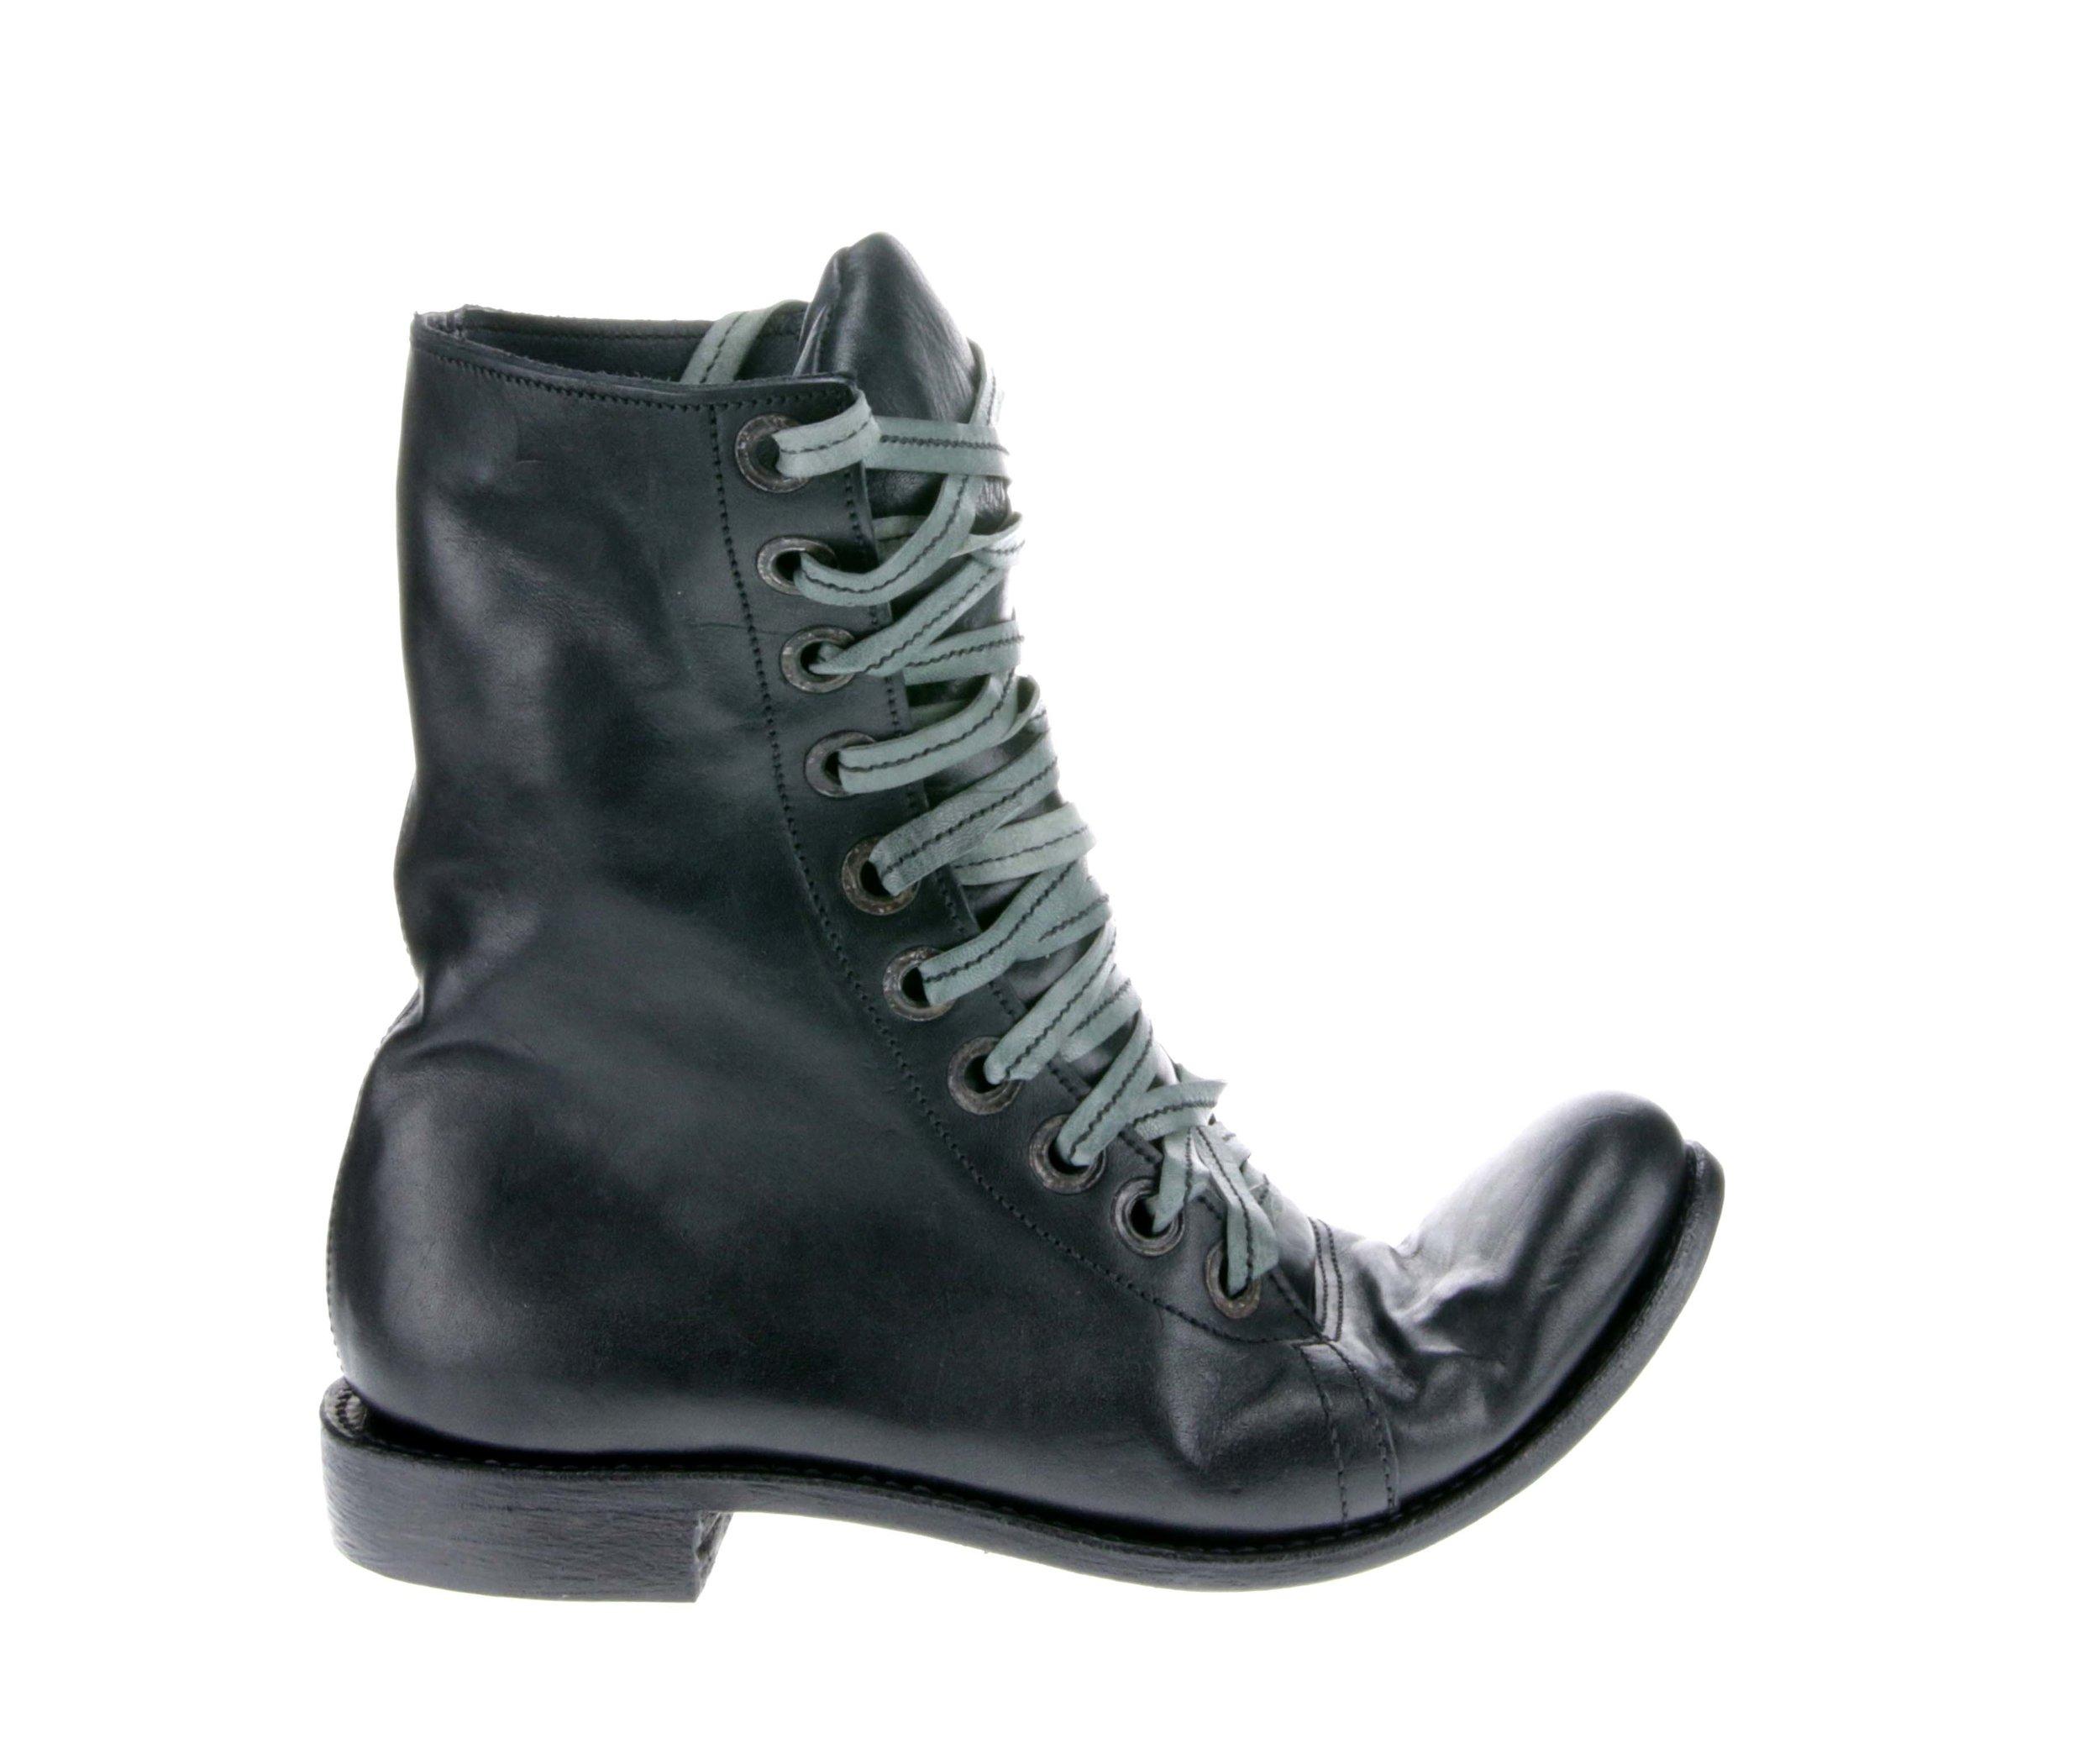 10Hole Work Boot Black Outside.jpg